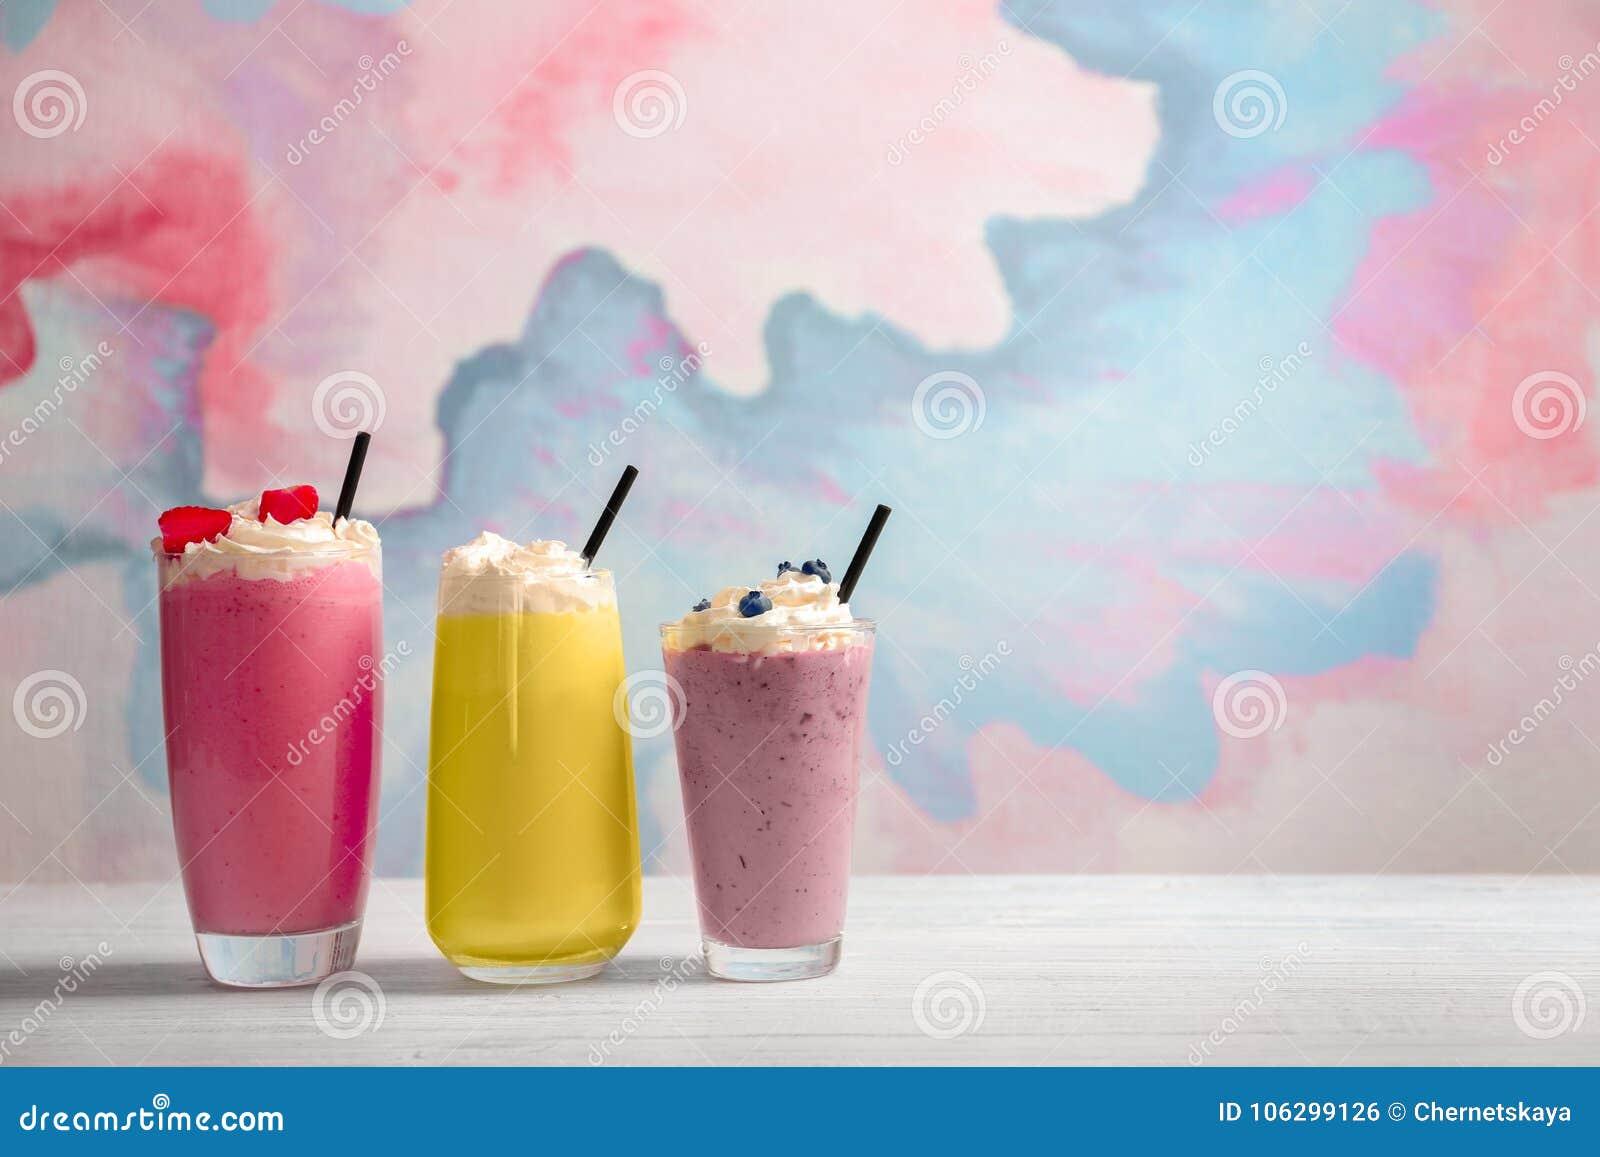 Different milkshakes in glasses on table